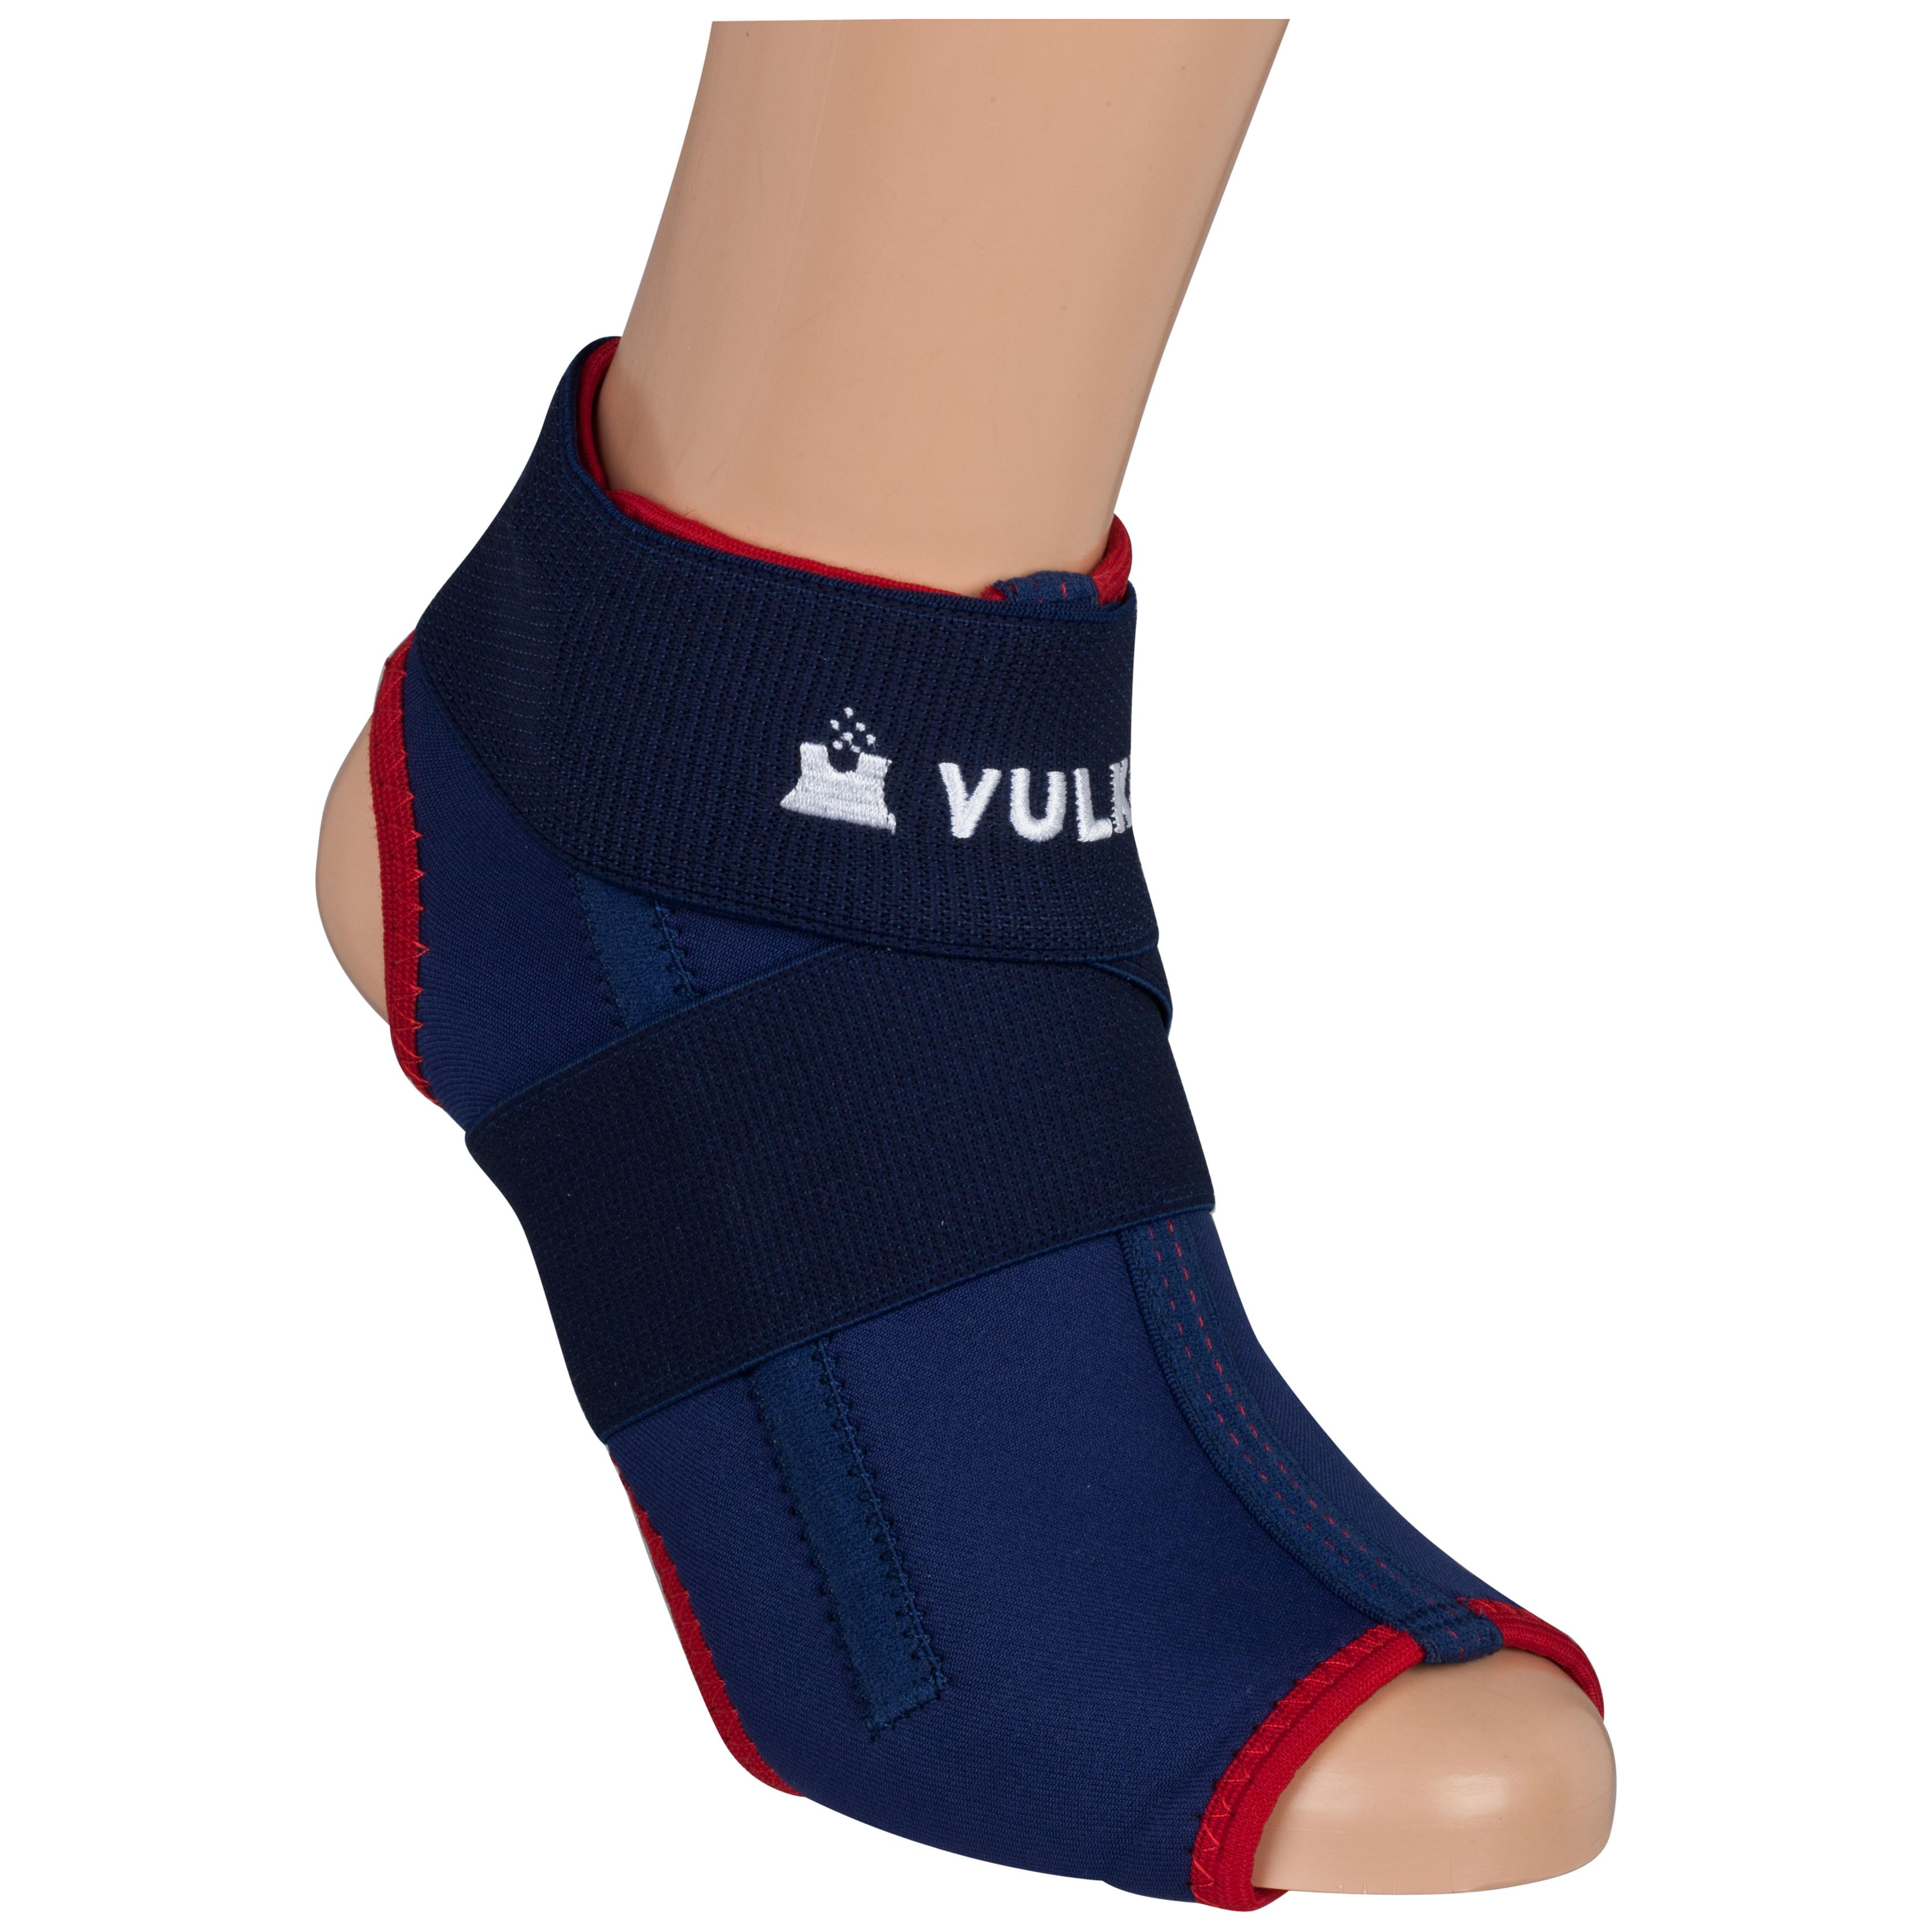 Vulkan Ankle Brace (Right) - Blue/Red